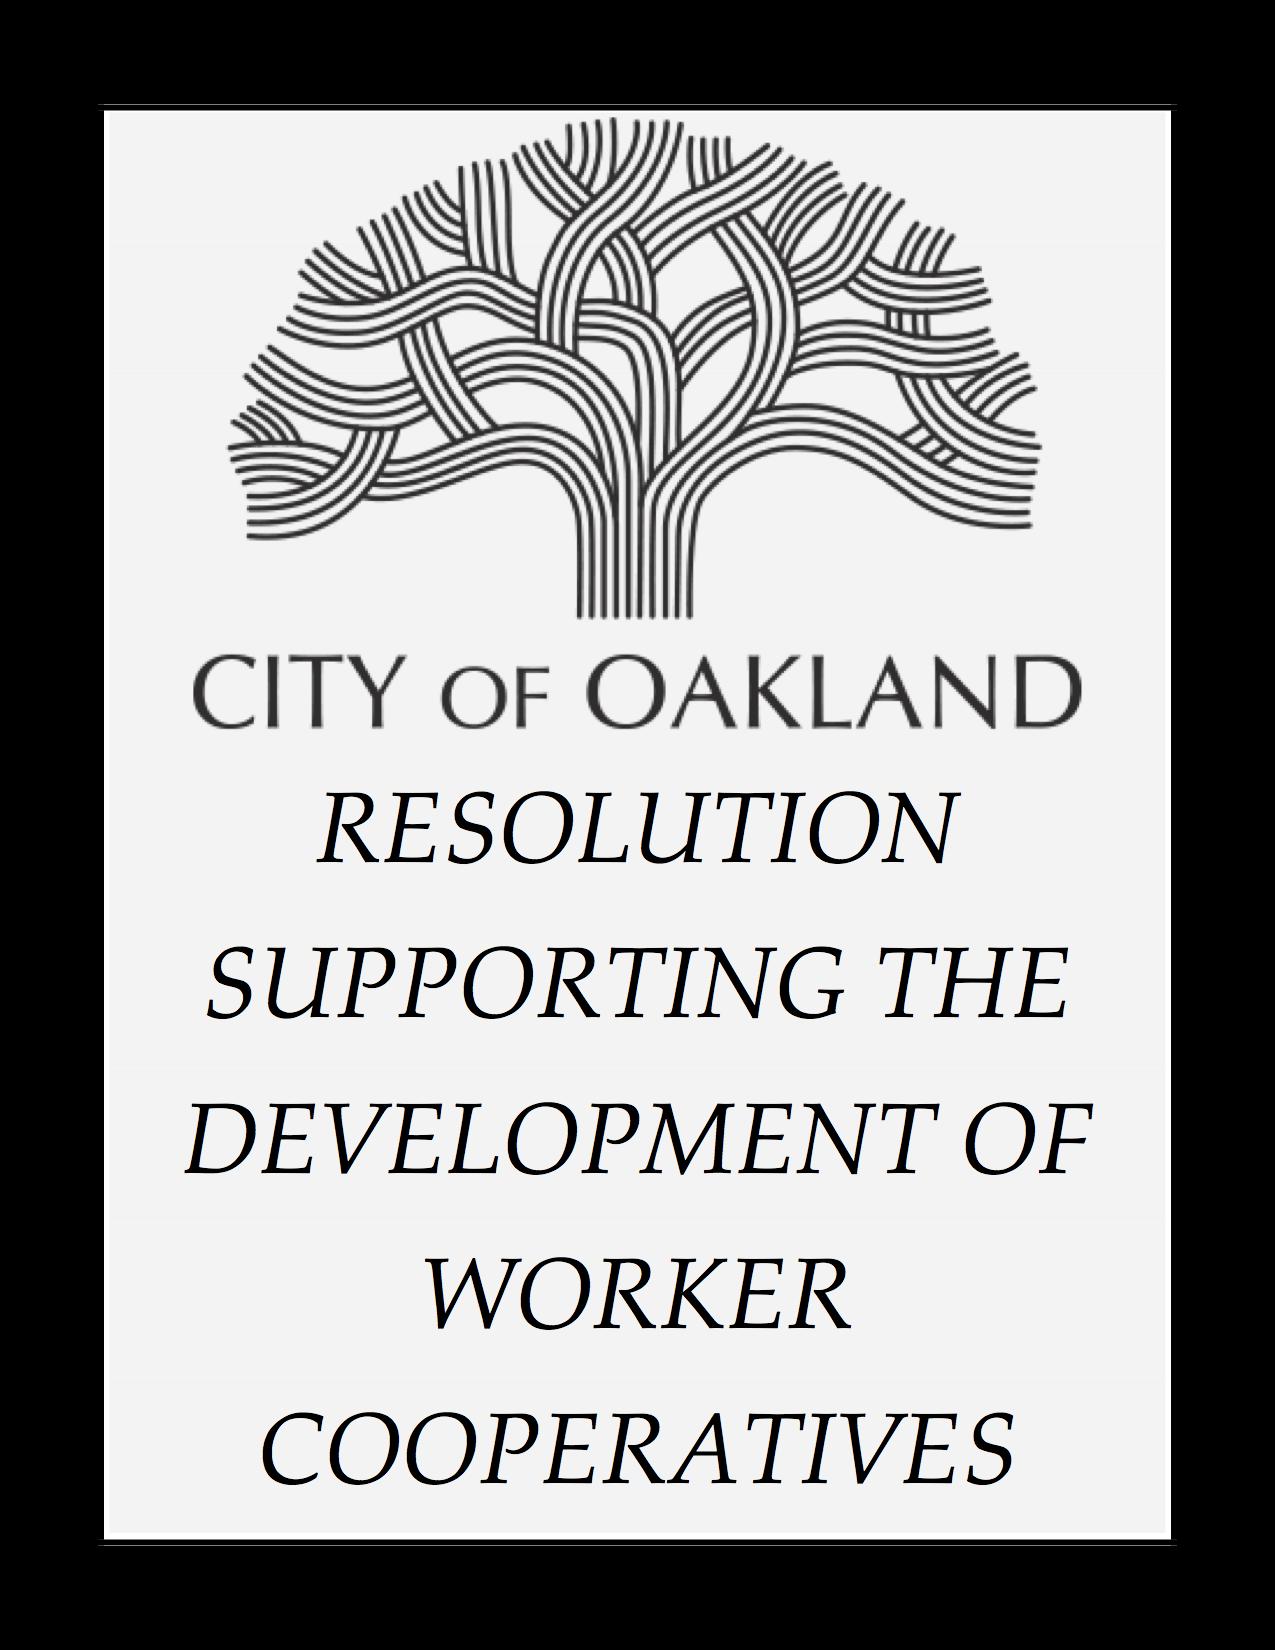 Worker Coop City Policies - Sustainable Economies Law Center